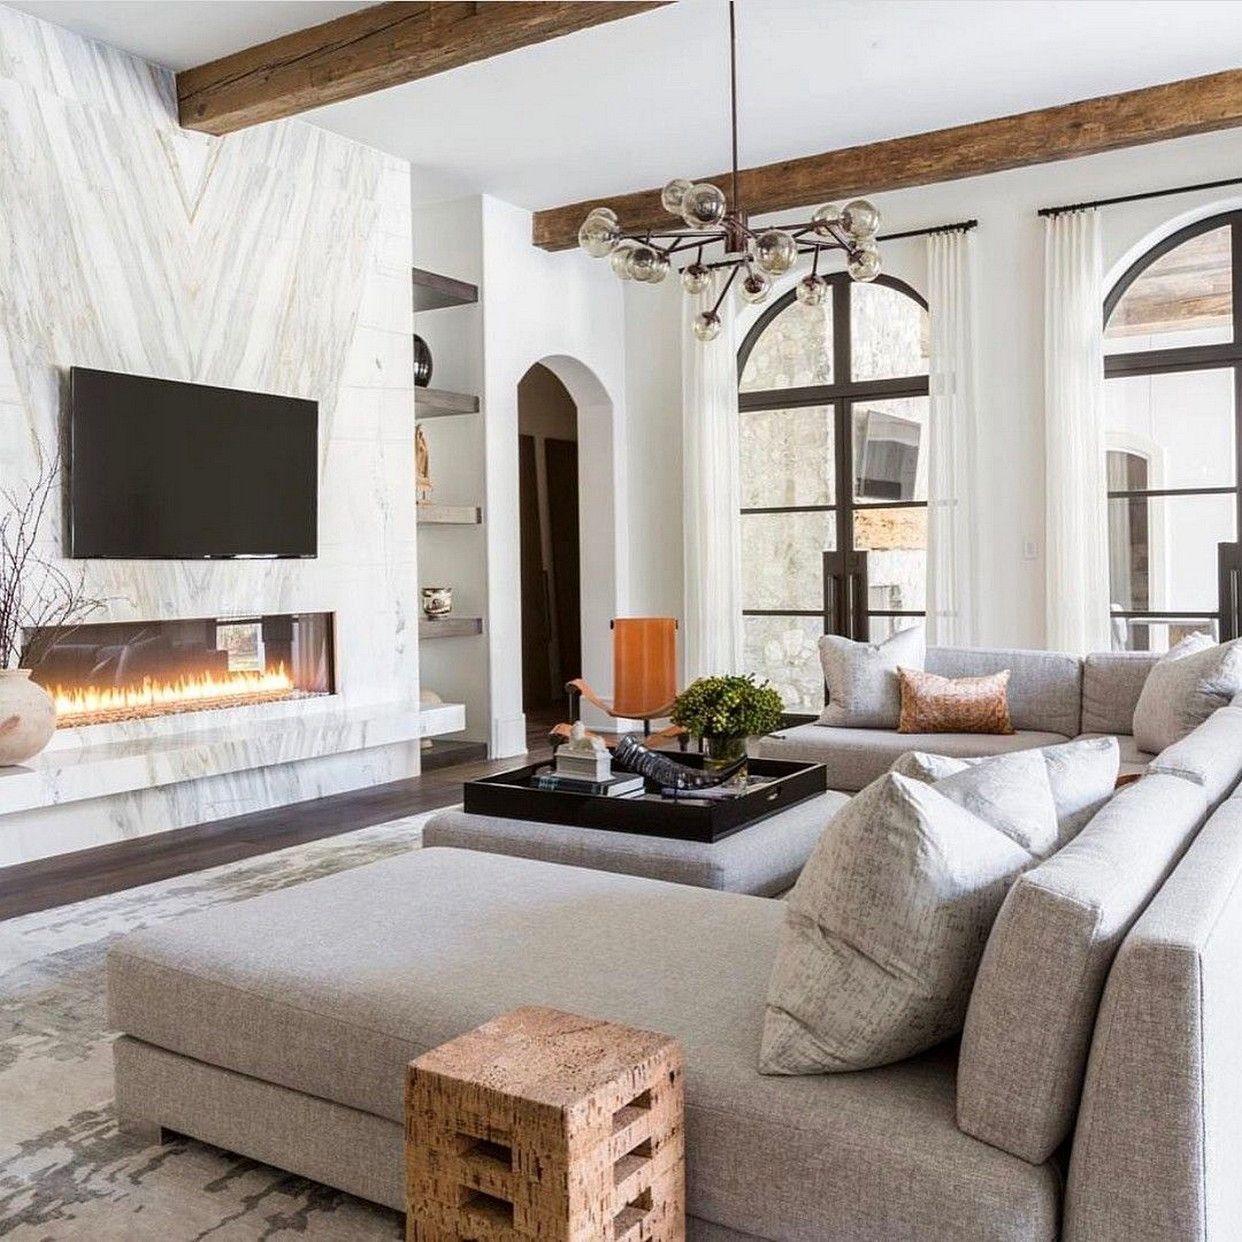 Elongate Living Room Design Create a Unique